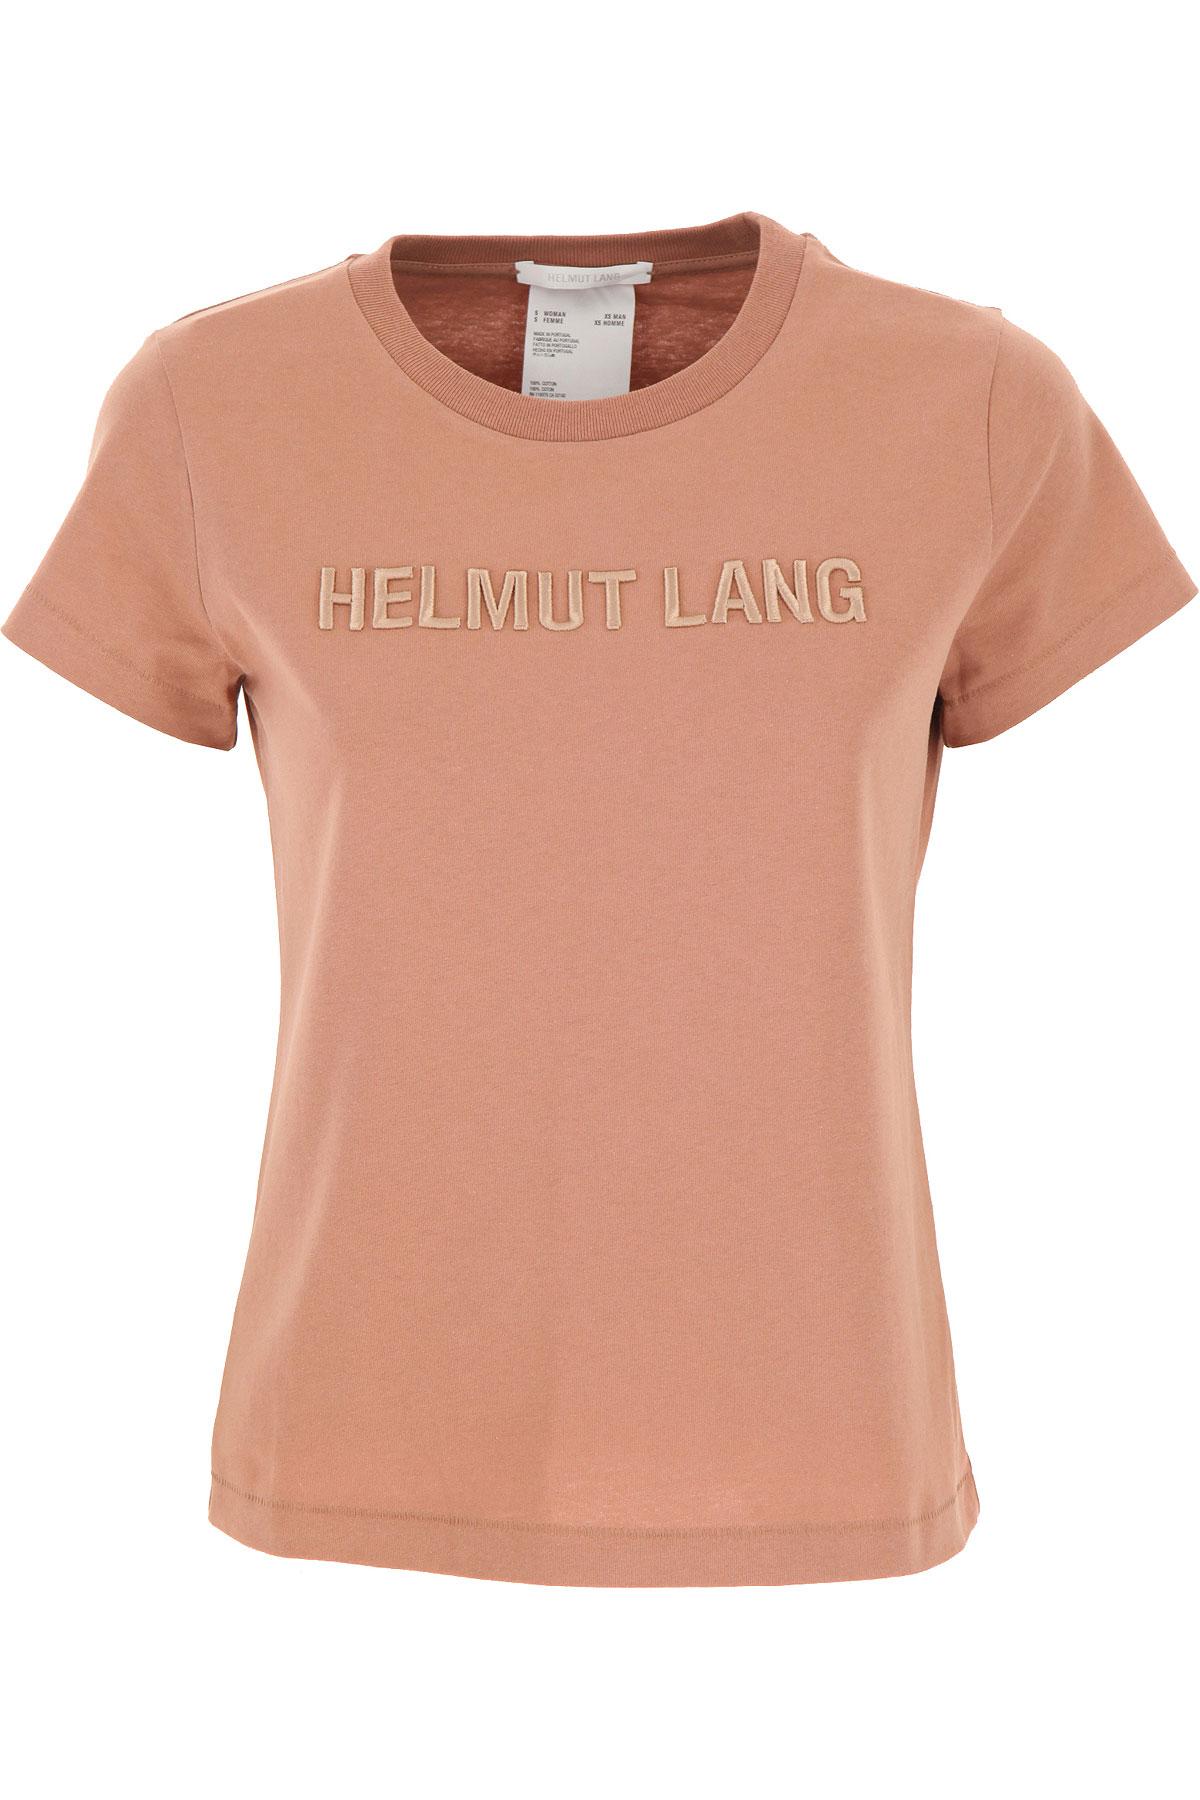 Helmut Lang T-Shirt for Women On Sale, Tan, Cotton, 2019, 4 6 8